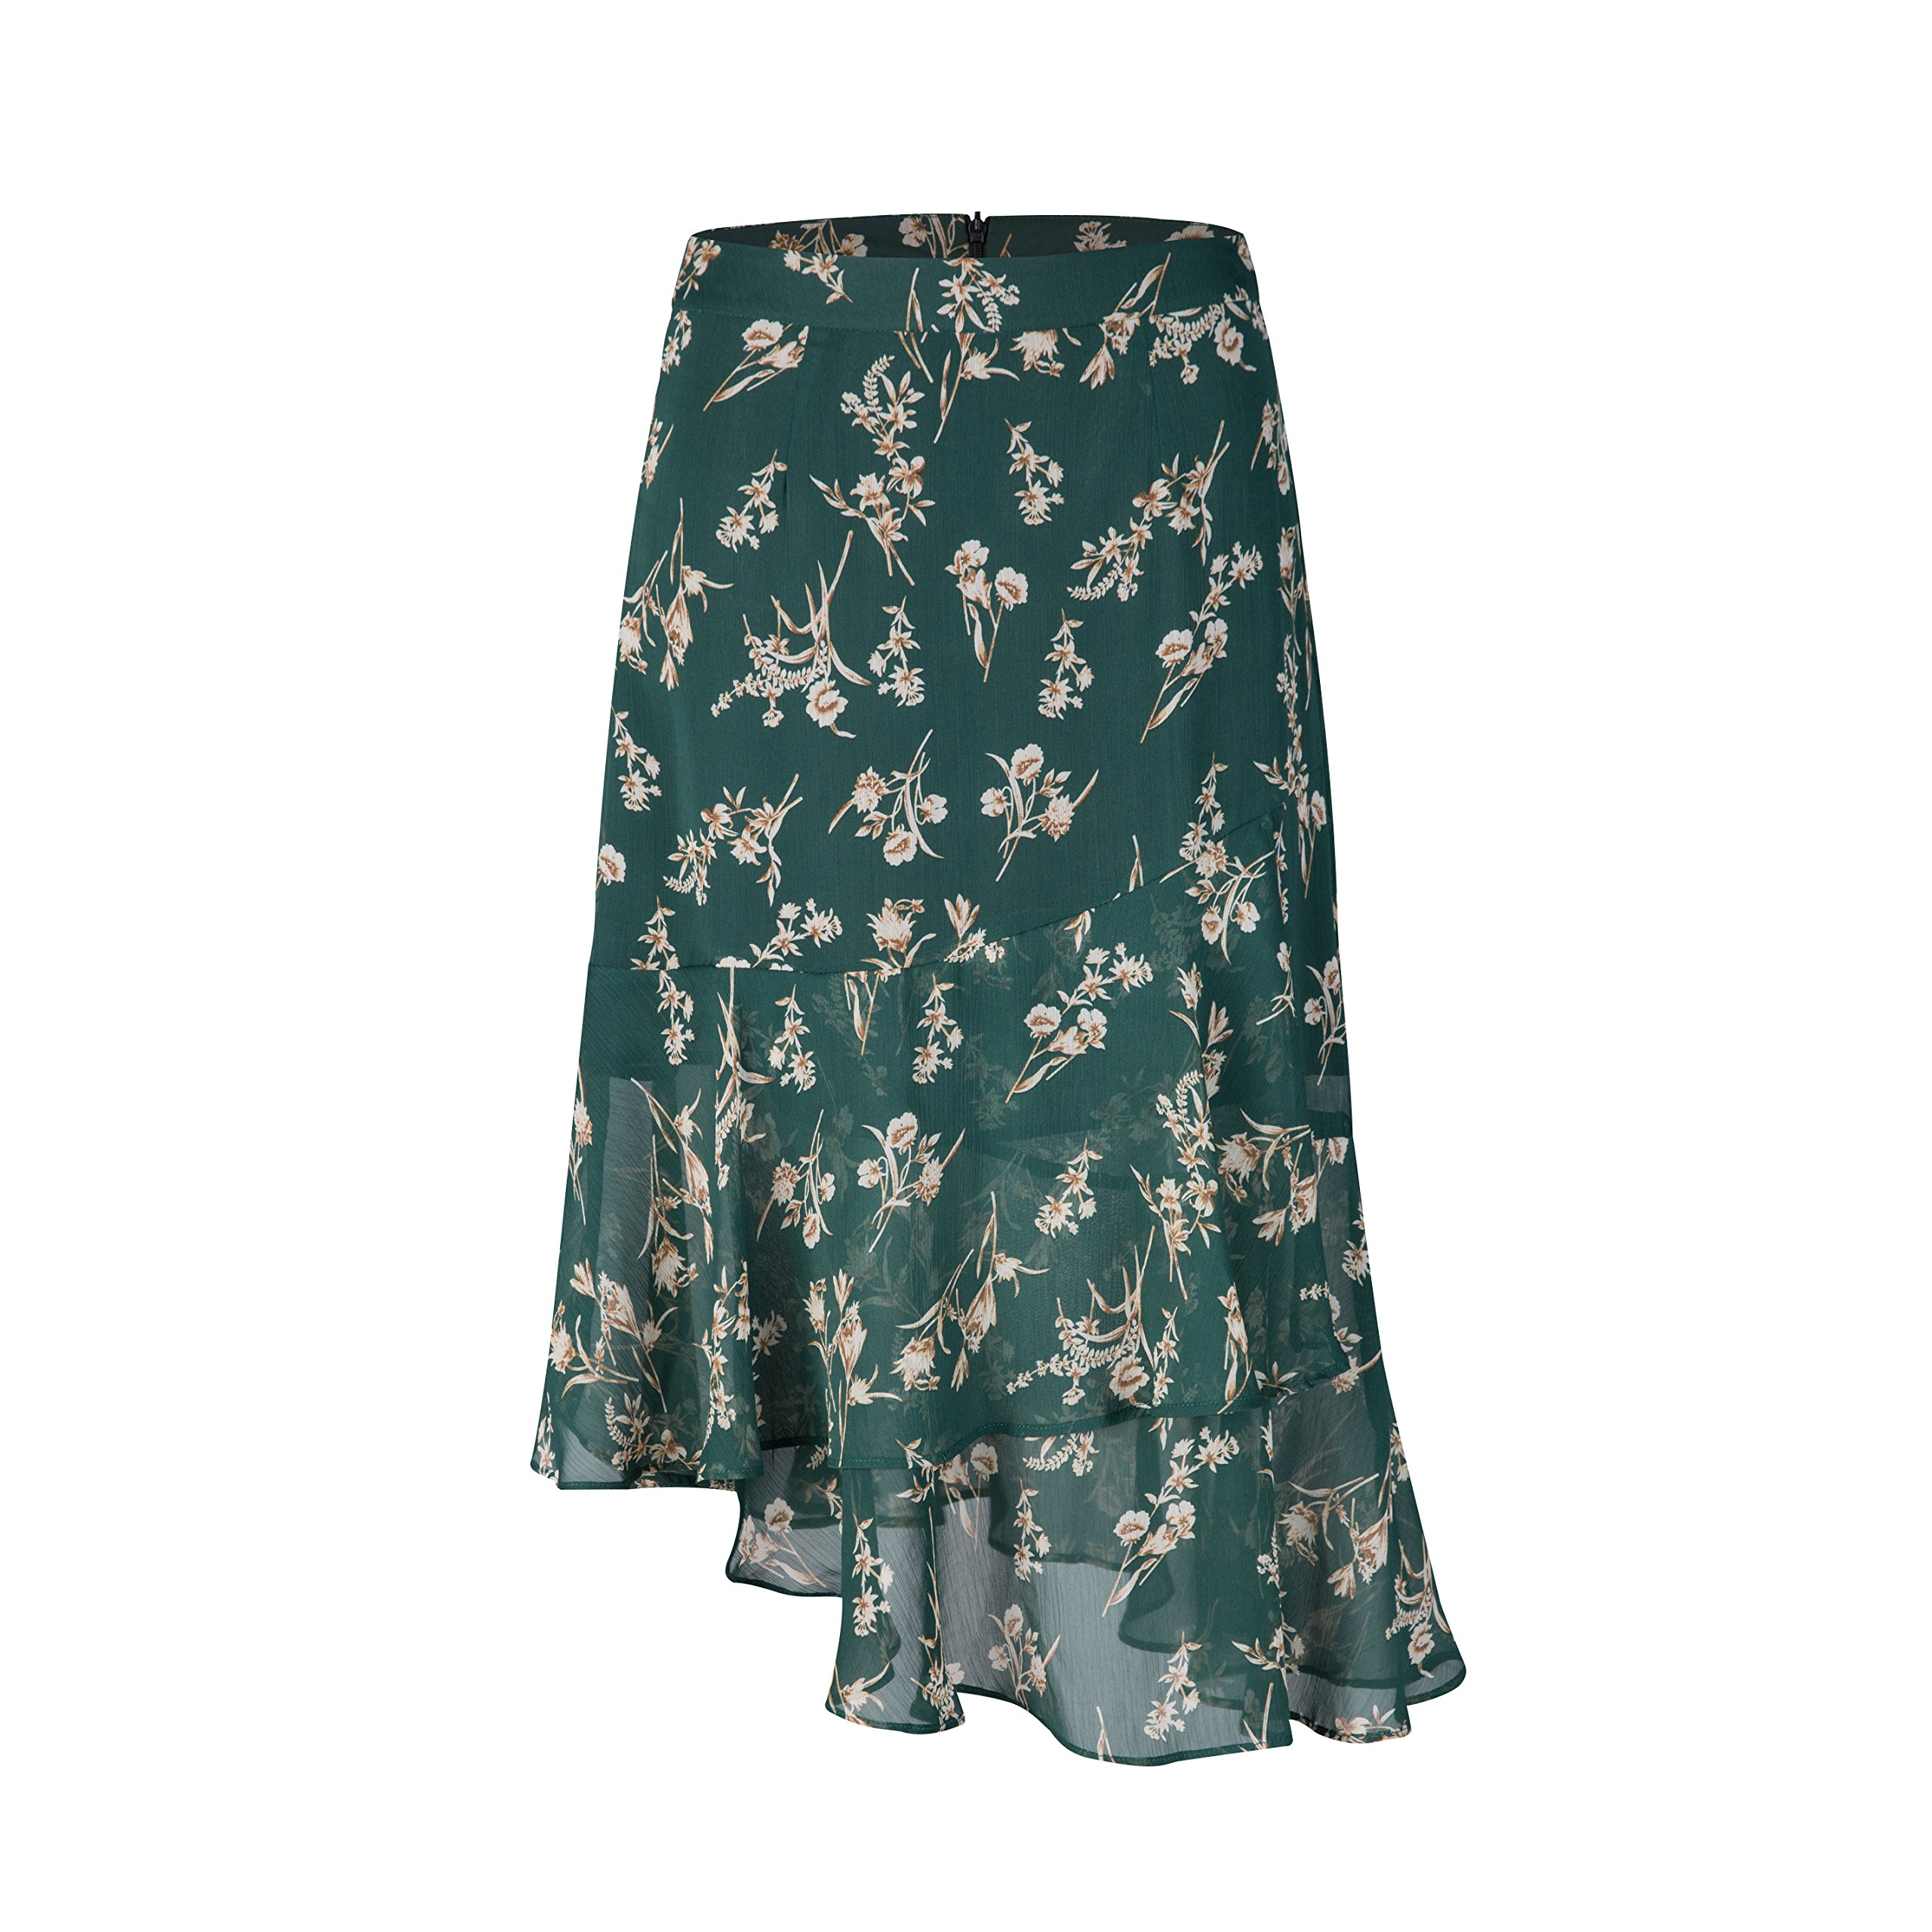 Tronjori Womens A Line Floral Print Skirt Flared Hem (S, Greeen Floral)